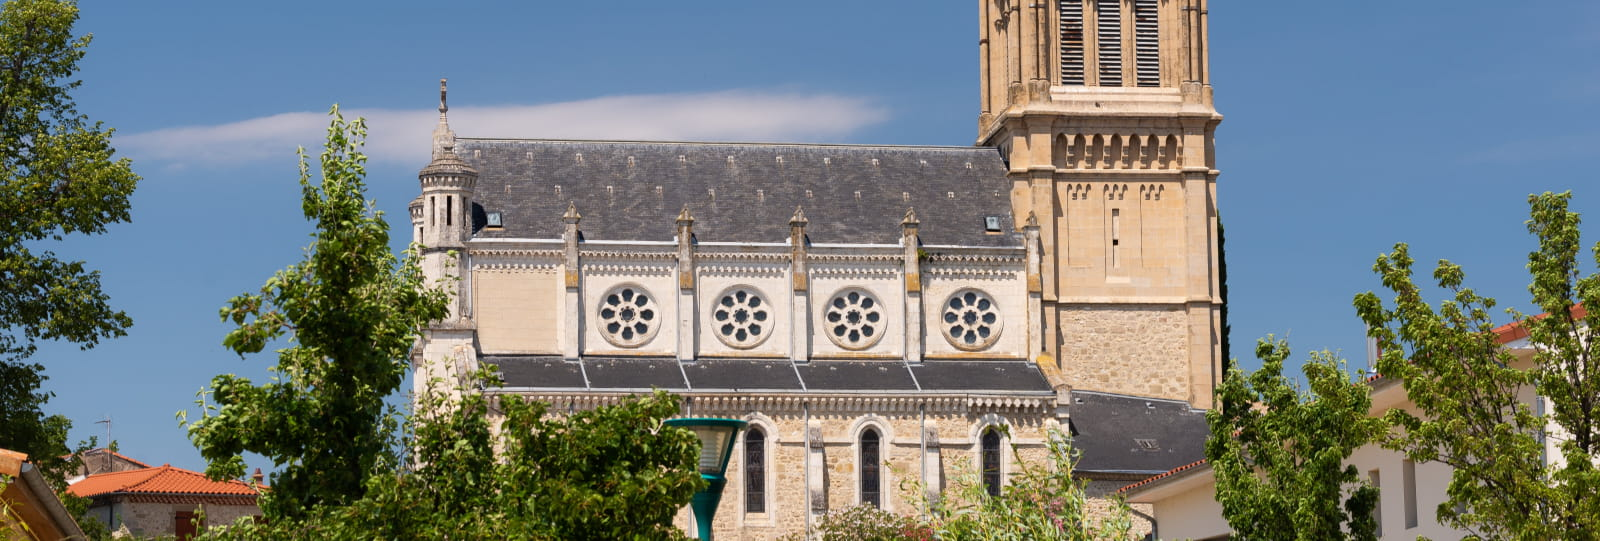 Eglise Saint Prix